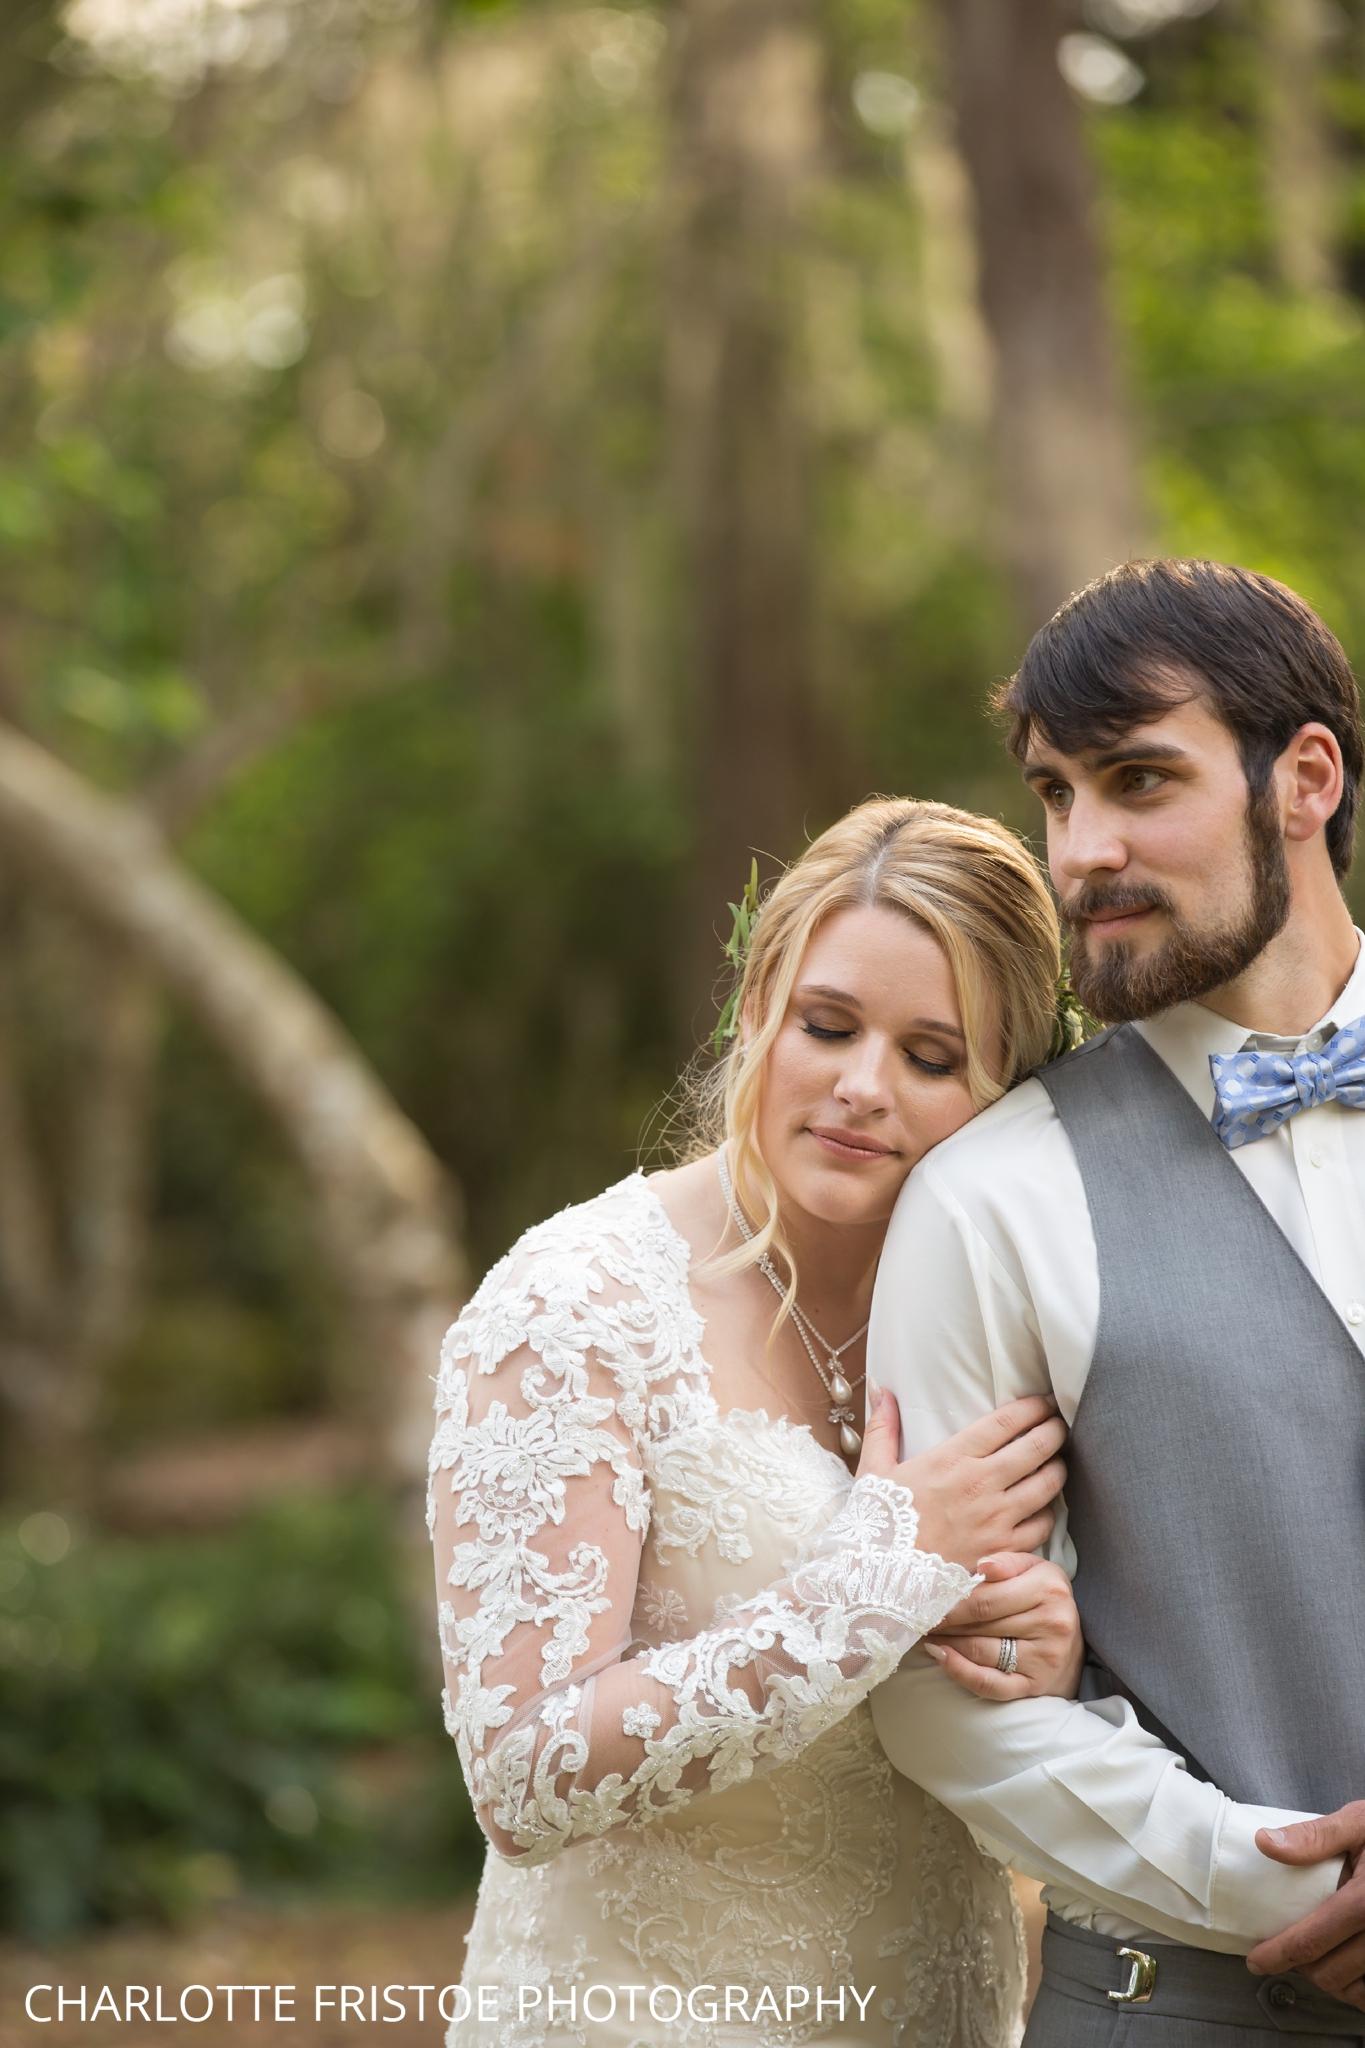 Charlotte Fristoe Photography Wedding-54.jpg